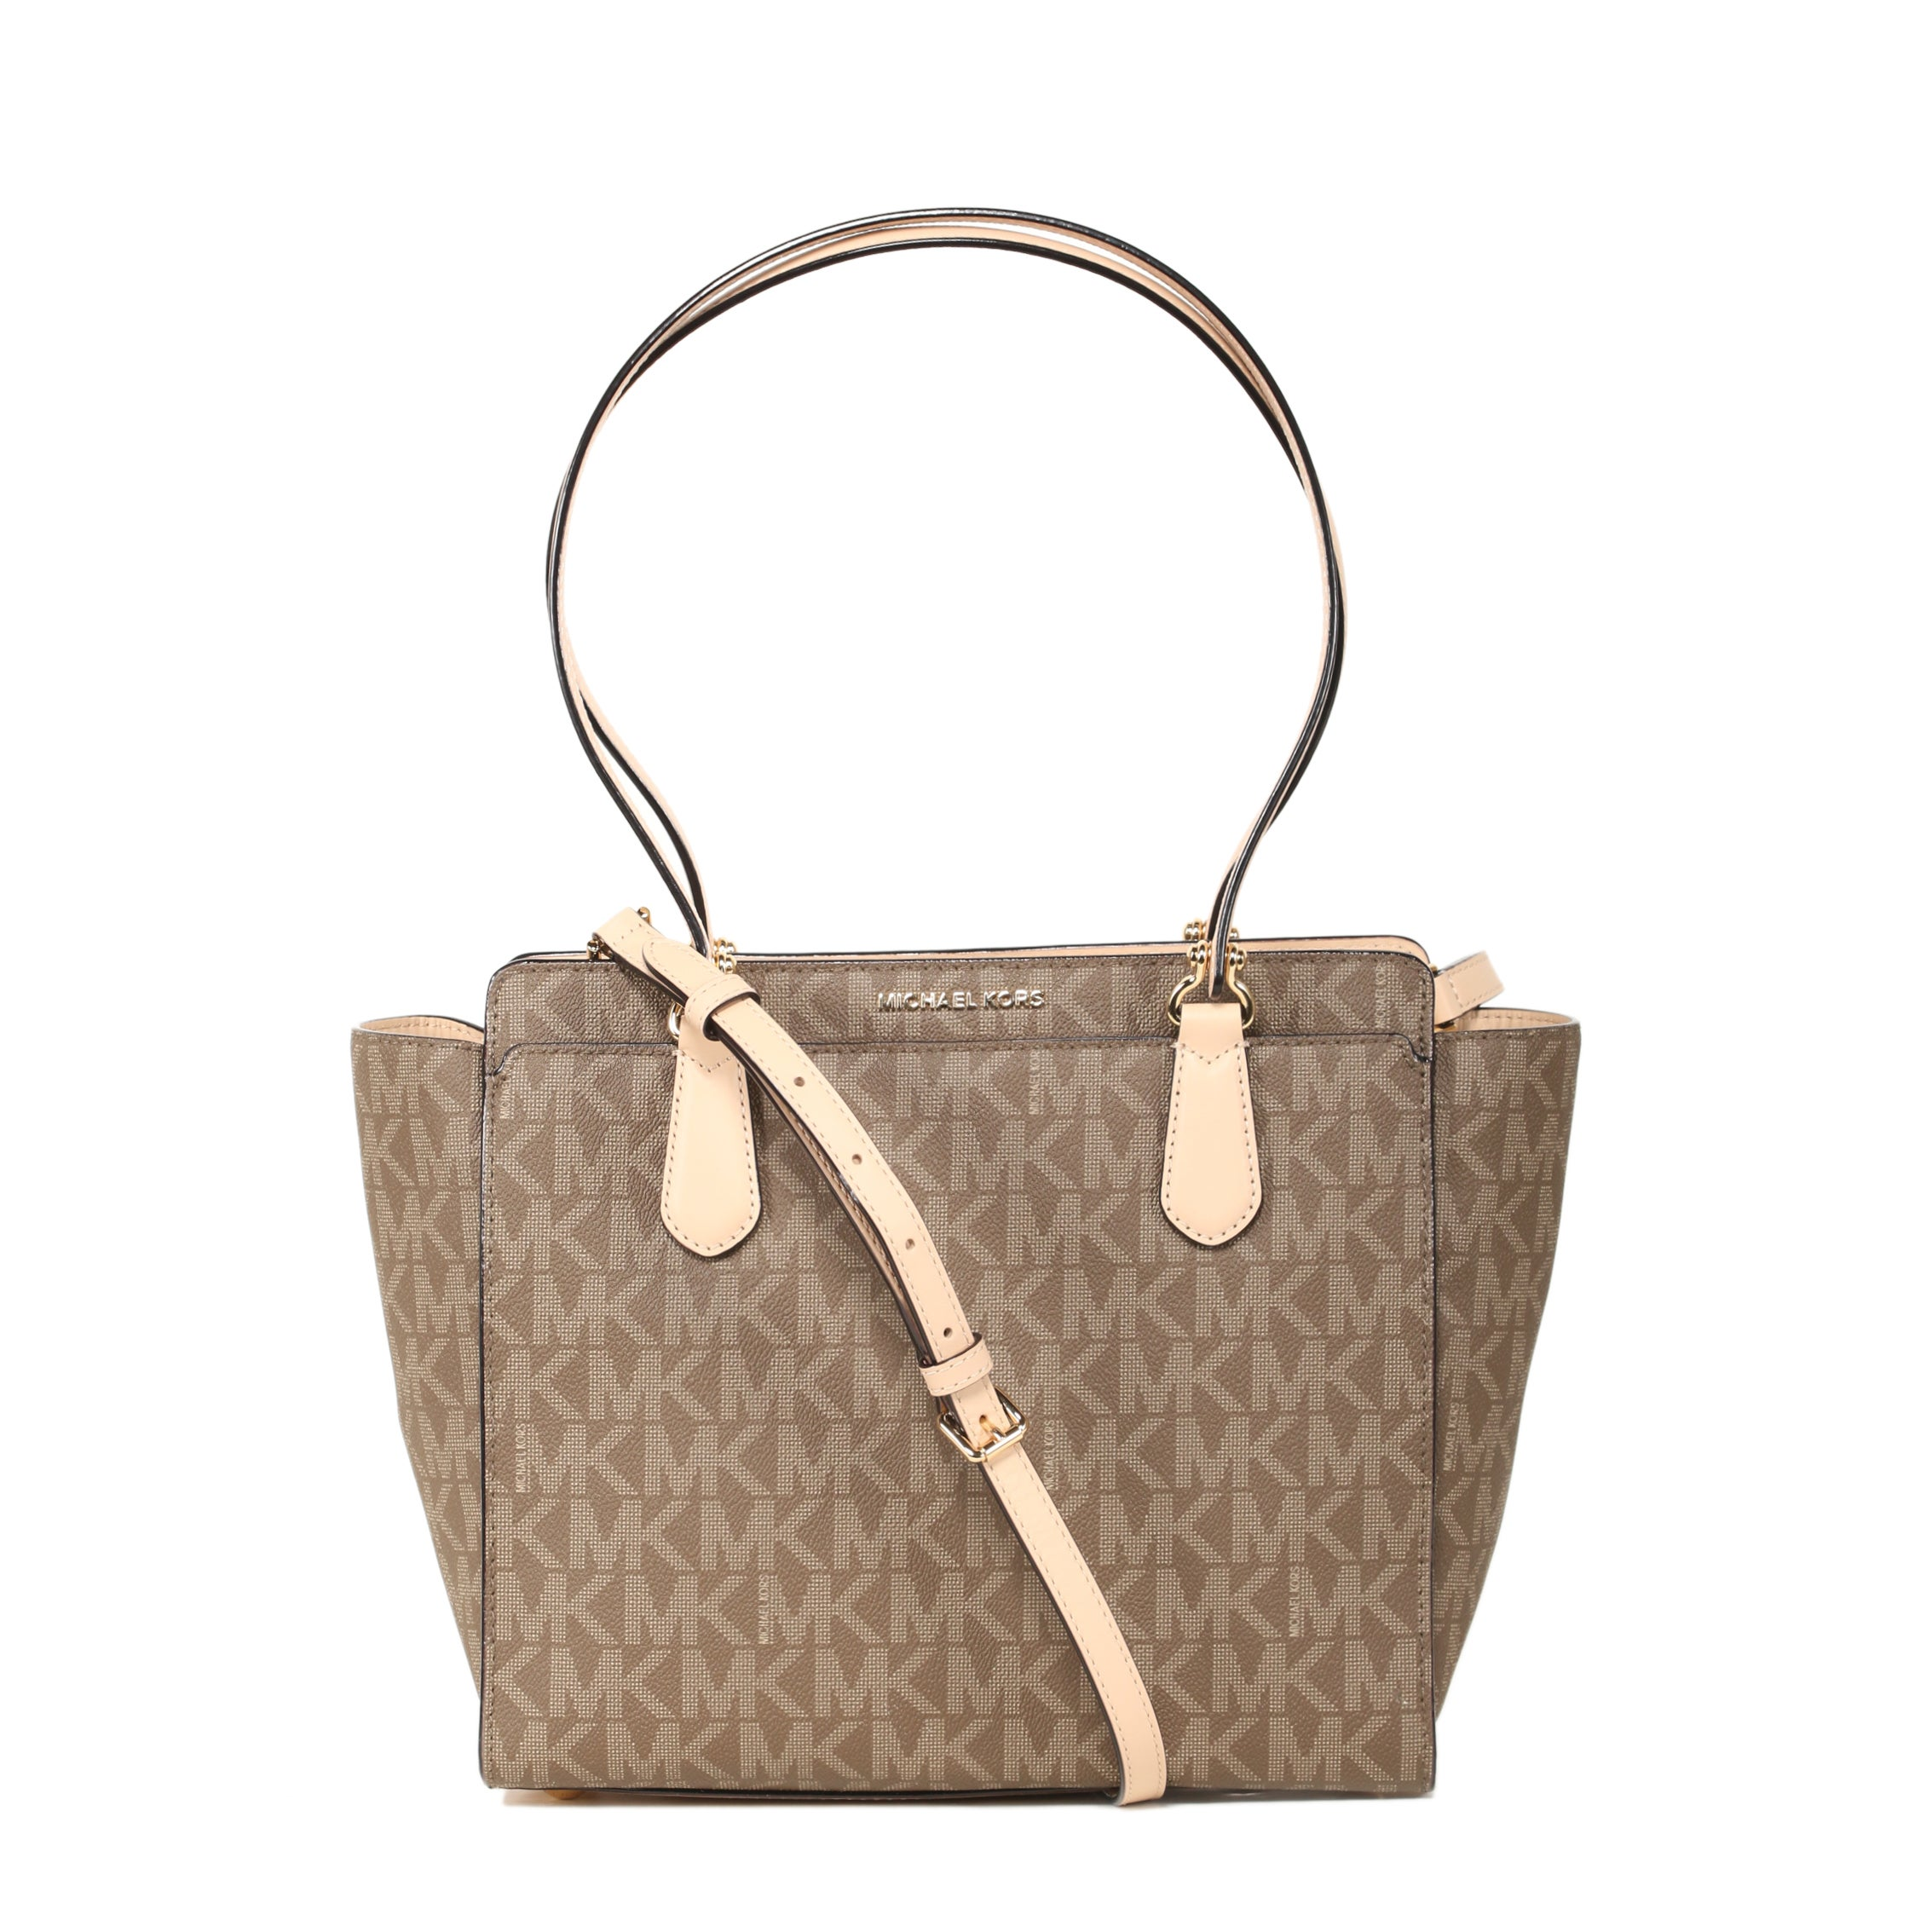 c6768e163772d6 Shop Michael Kors Dee Dee Medium Mocha Convertible Tote Bag - Free Shipping  Today - Overstock - 16849464